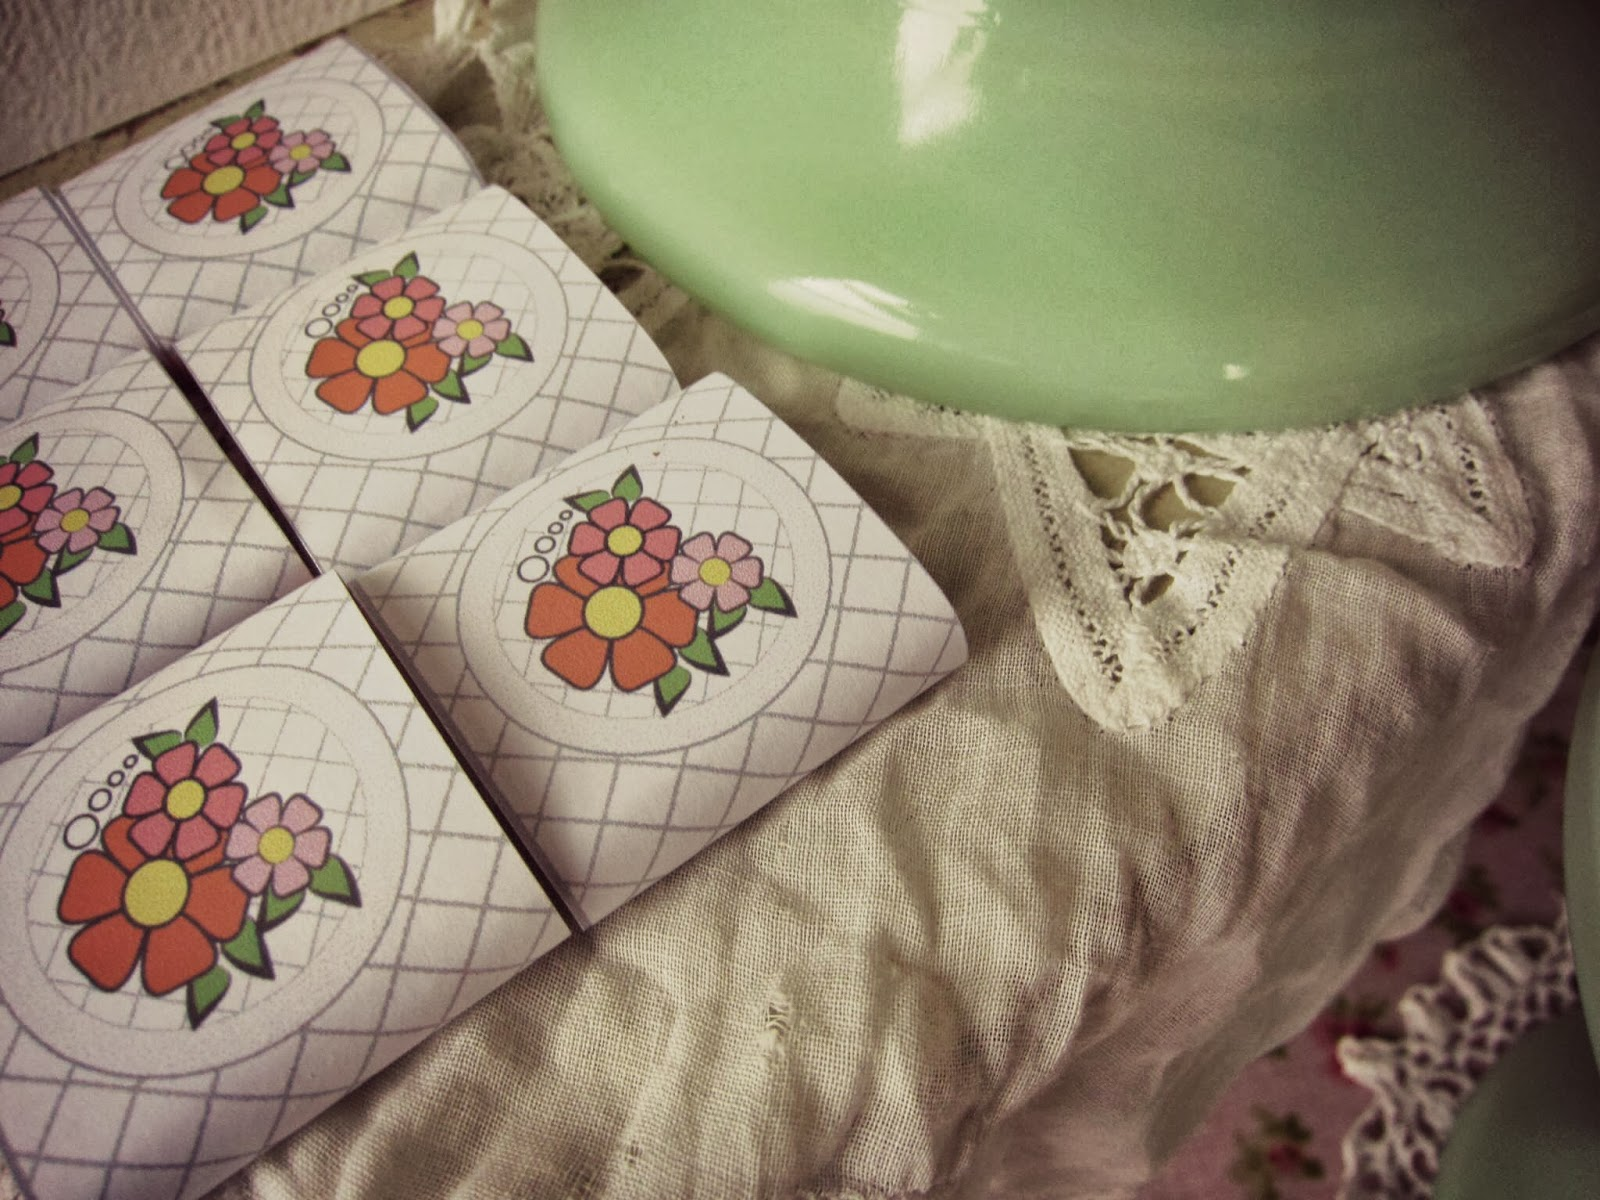 carres de chocolats entoures de papier fleuri